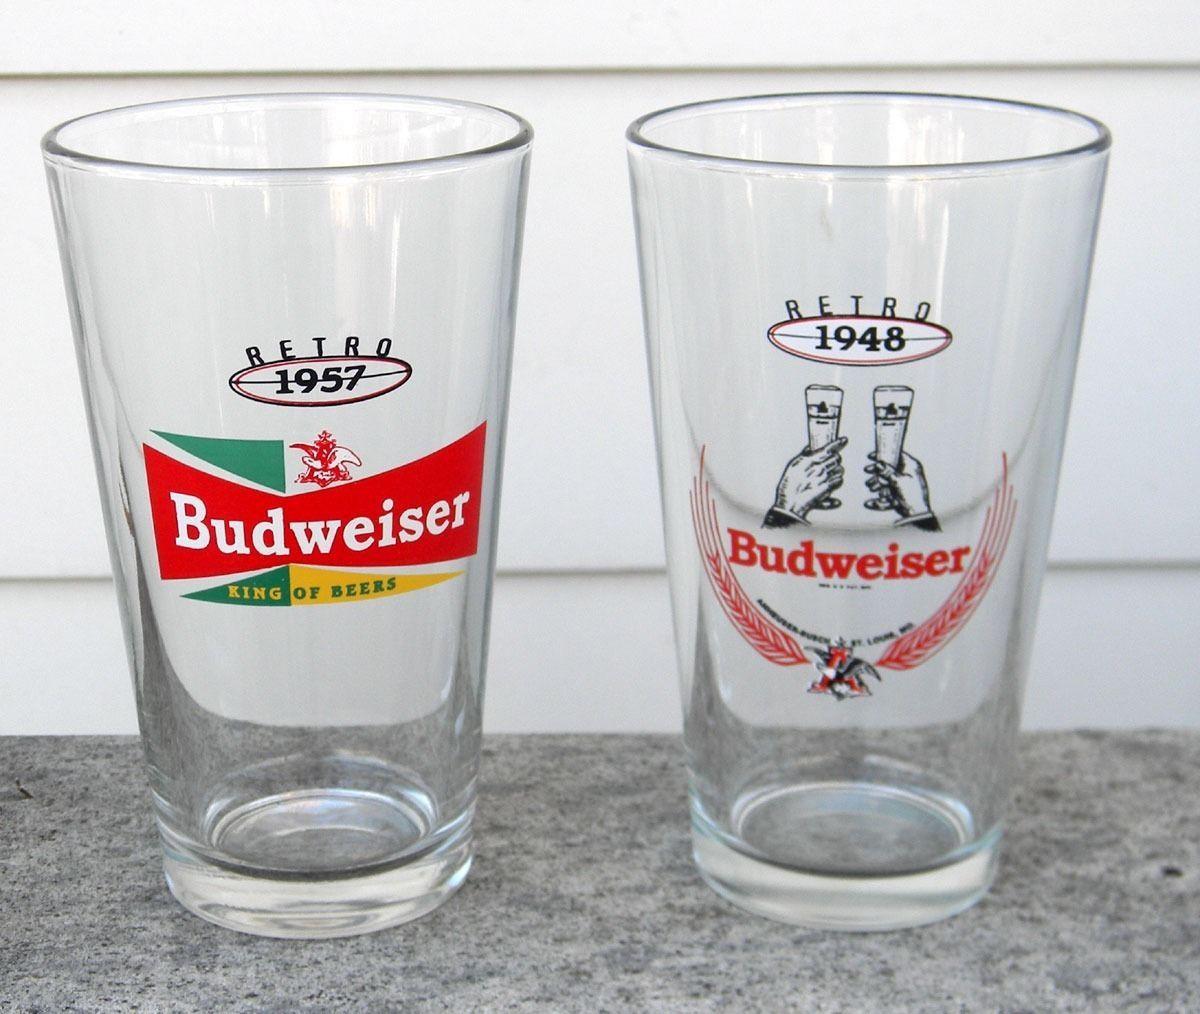 2 NEW BUDWEISER RETRO BEER PINT GLASSES 1948 1957 16 OZ BUD